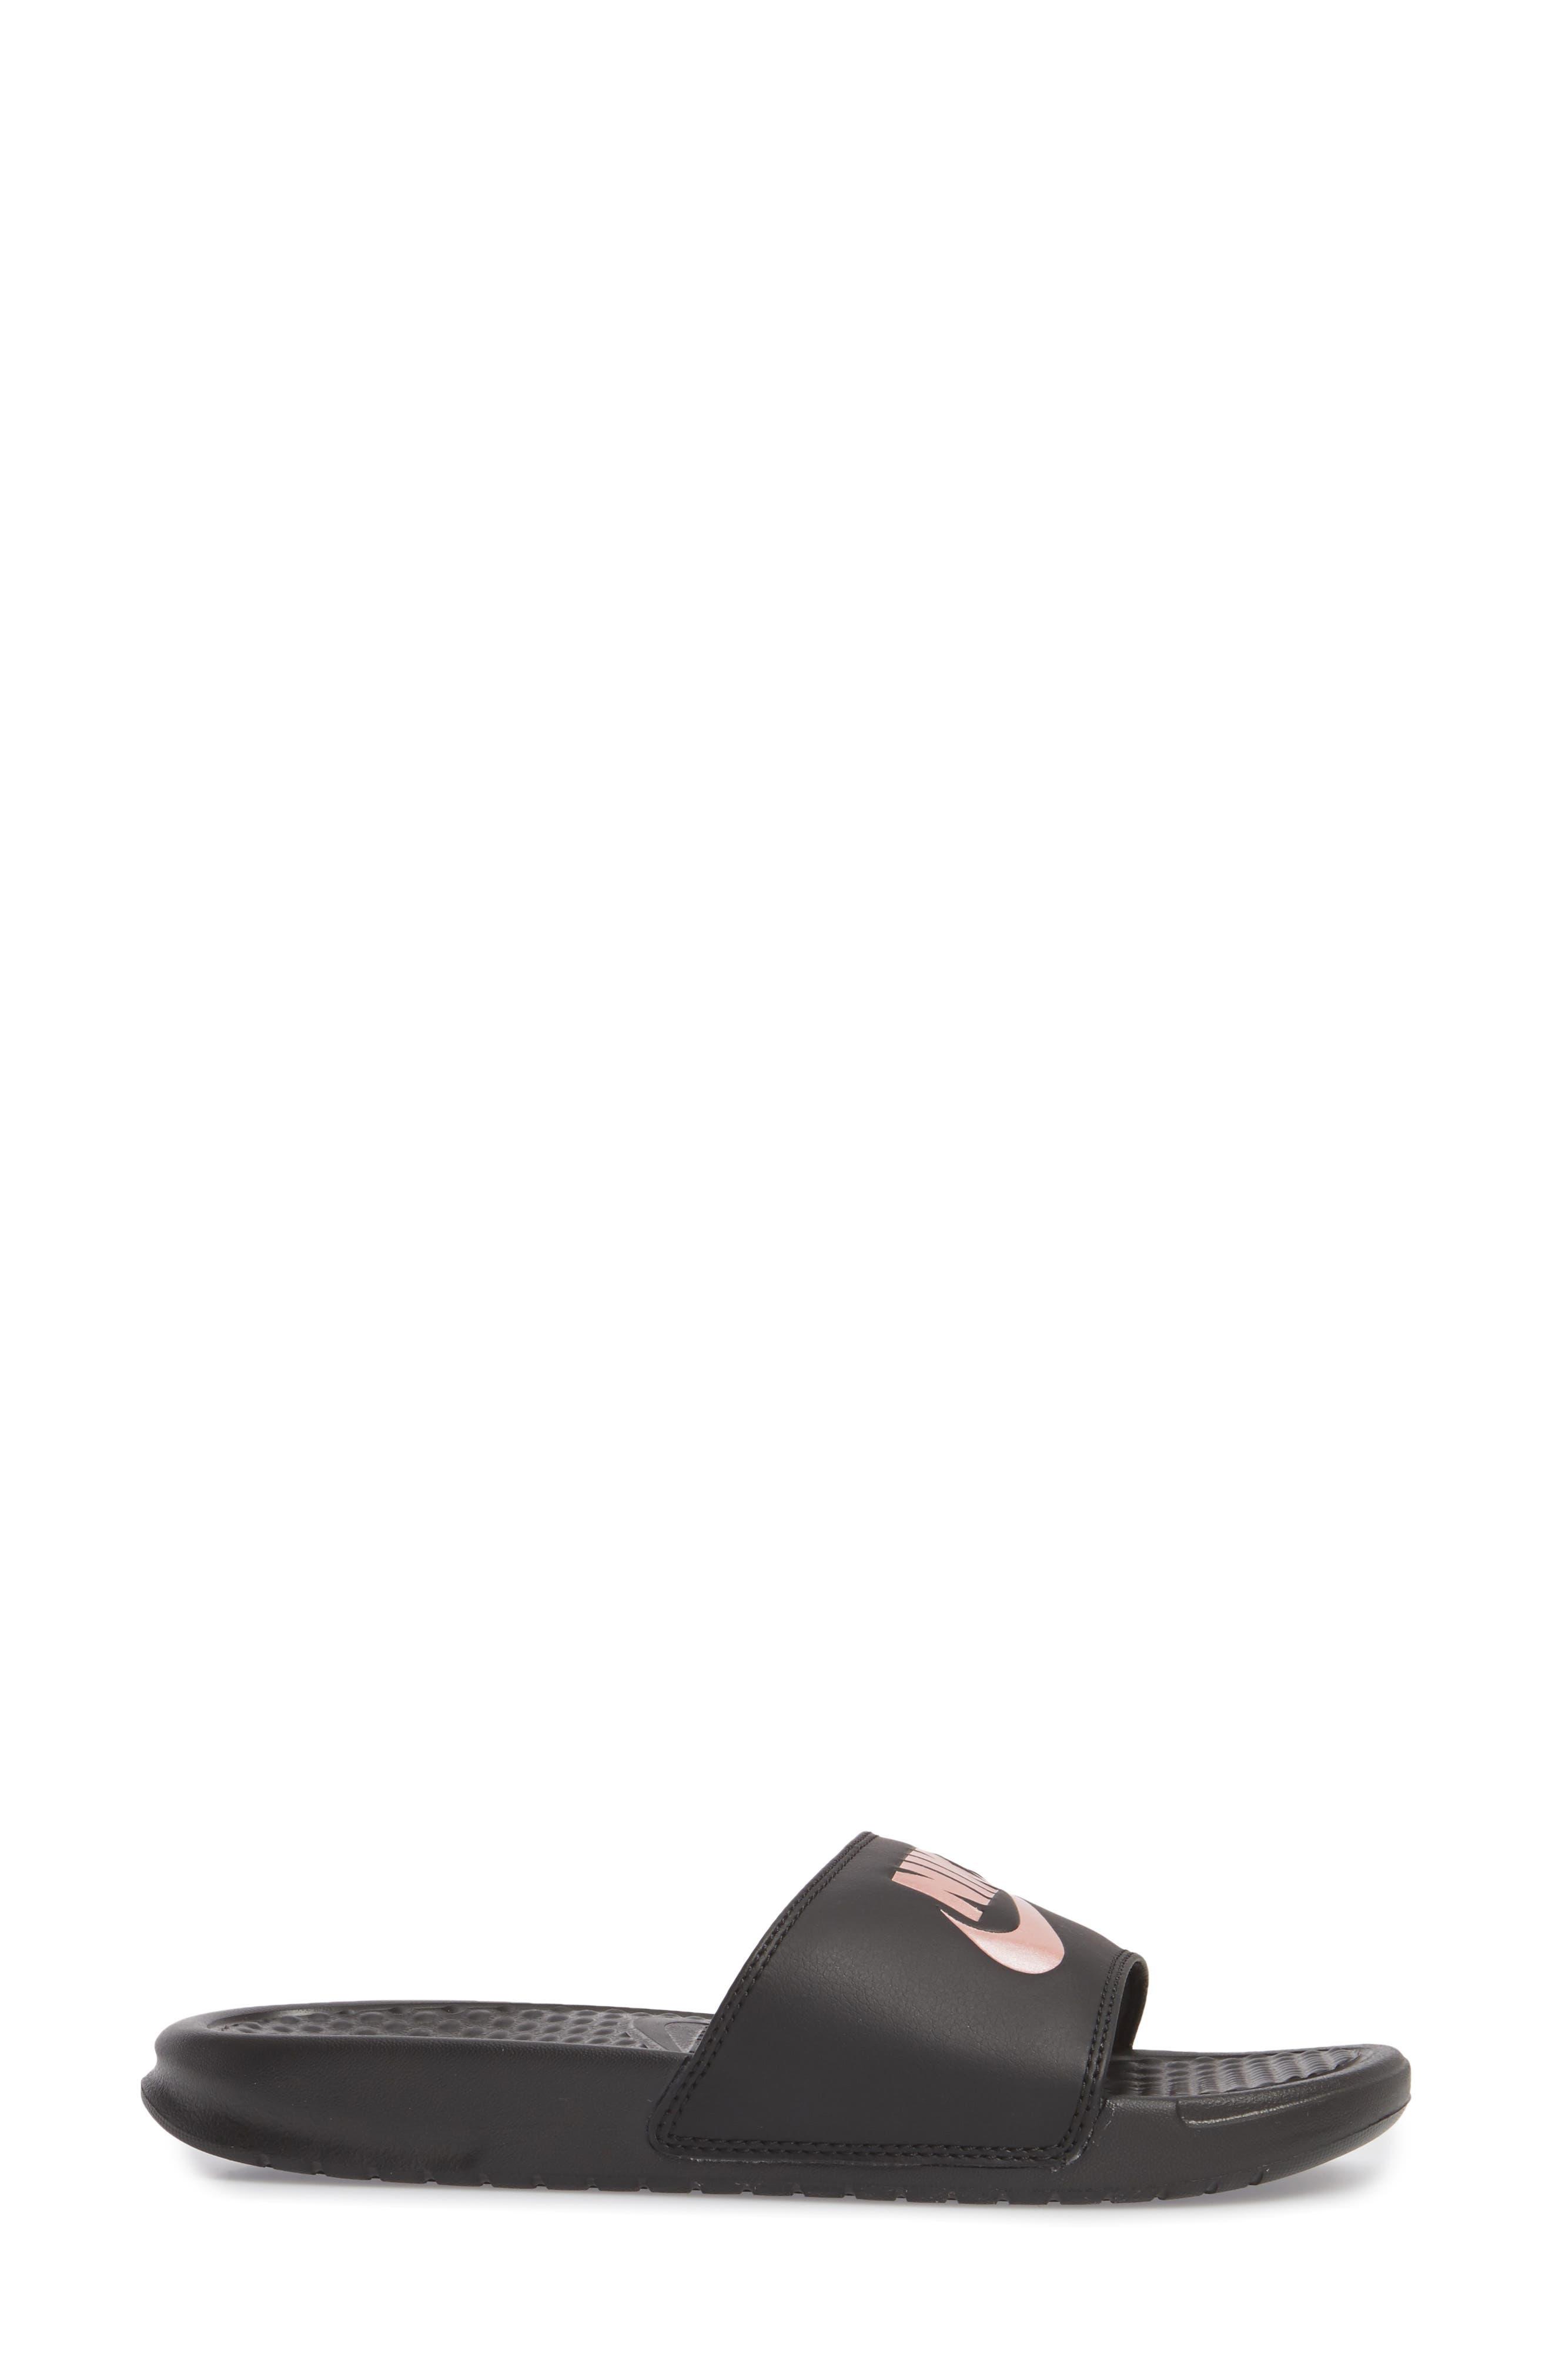 Benassi JDI Slide Sandal,                             Alternate thumbnail 11, color,